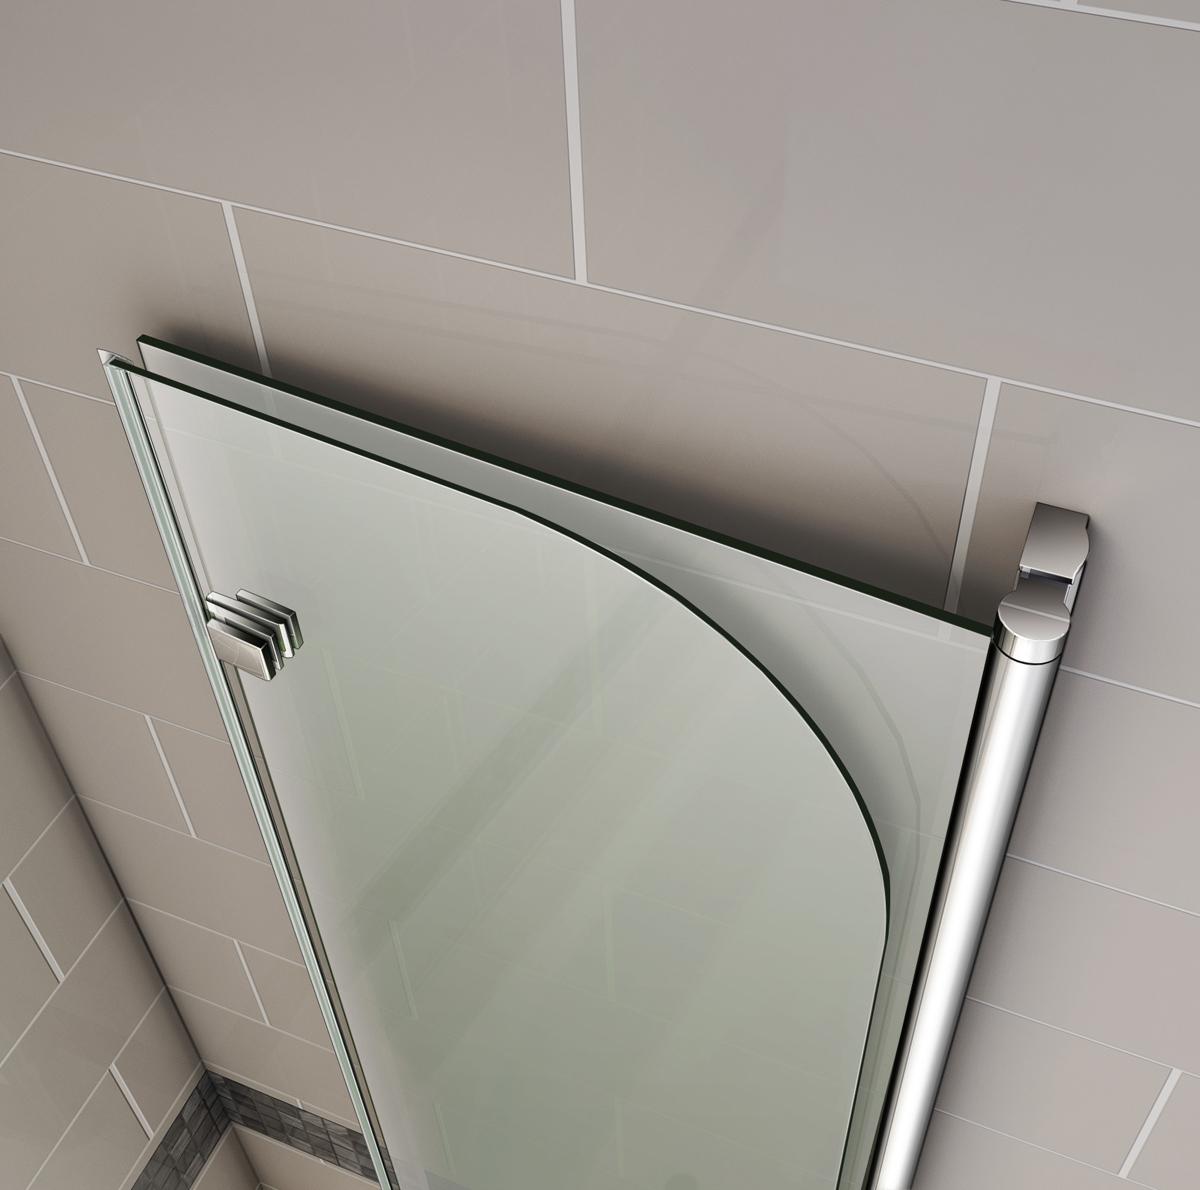 90x140cm badewanne 2 tlg faltwand duschwand dusche - Faltwand dusche ...